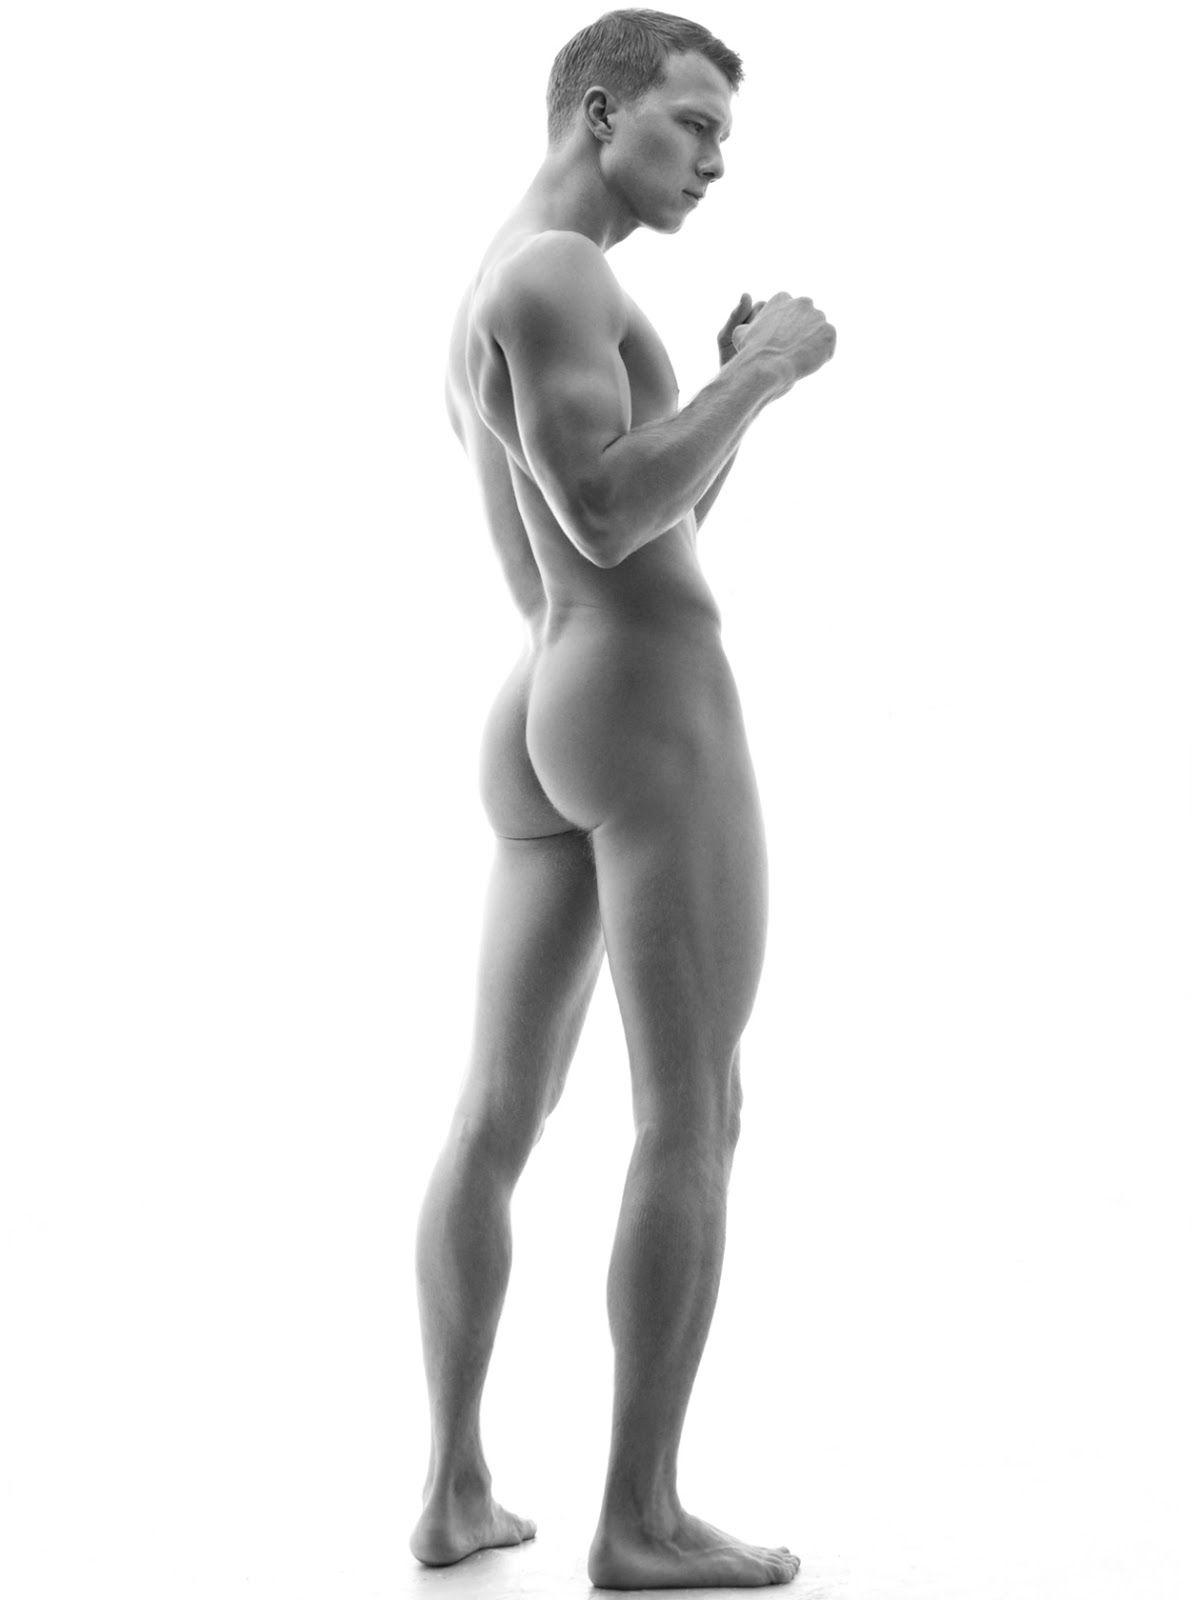 Pin de Arucelli en Ref - Anatomy (male) | Pinterest | Anatomía ...